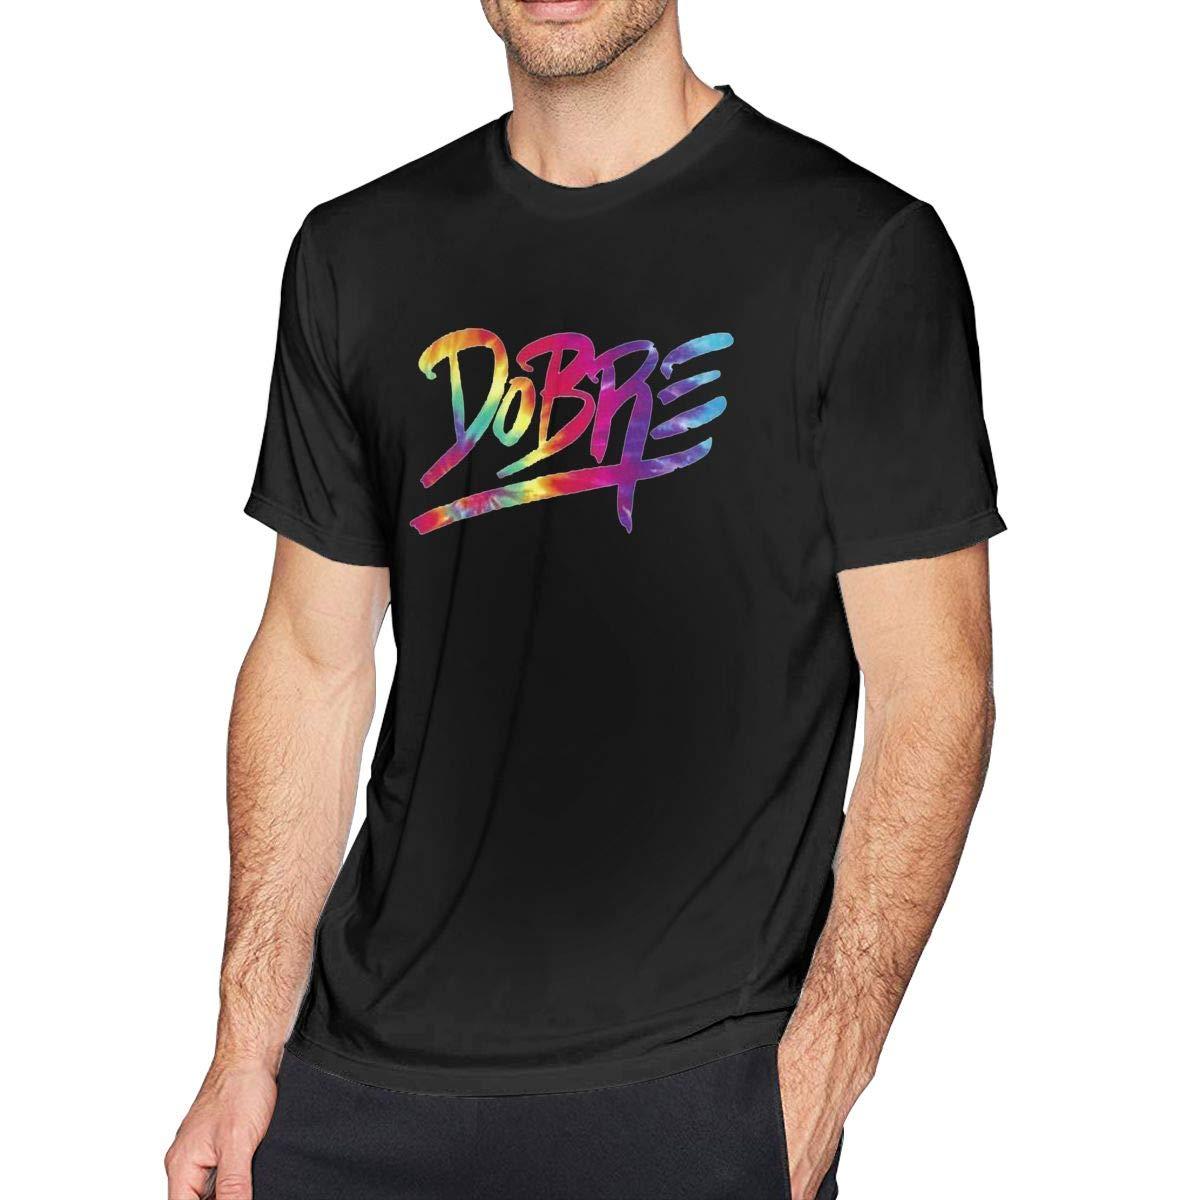 Men's Dobre - Brothers Basic Shirts Summer T Shirt Short Sleeve T-Shirt Round Neck Cotton Sport Tops Black 35